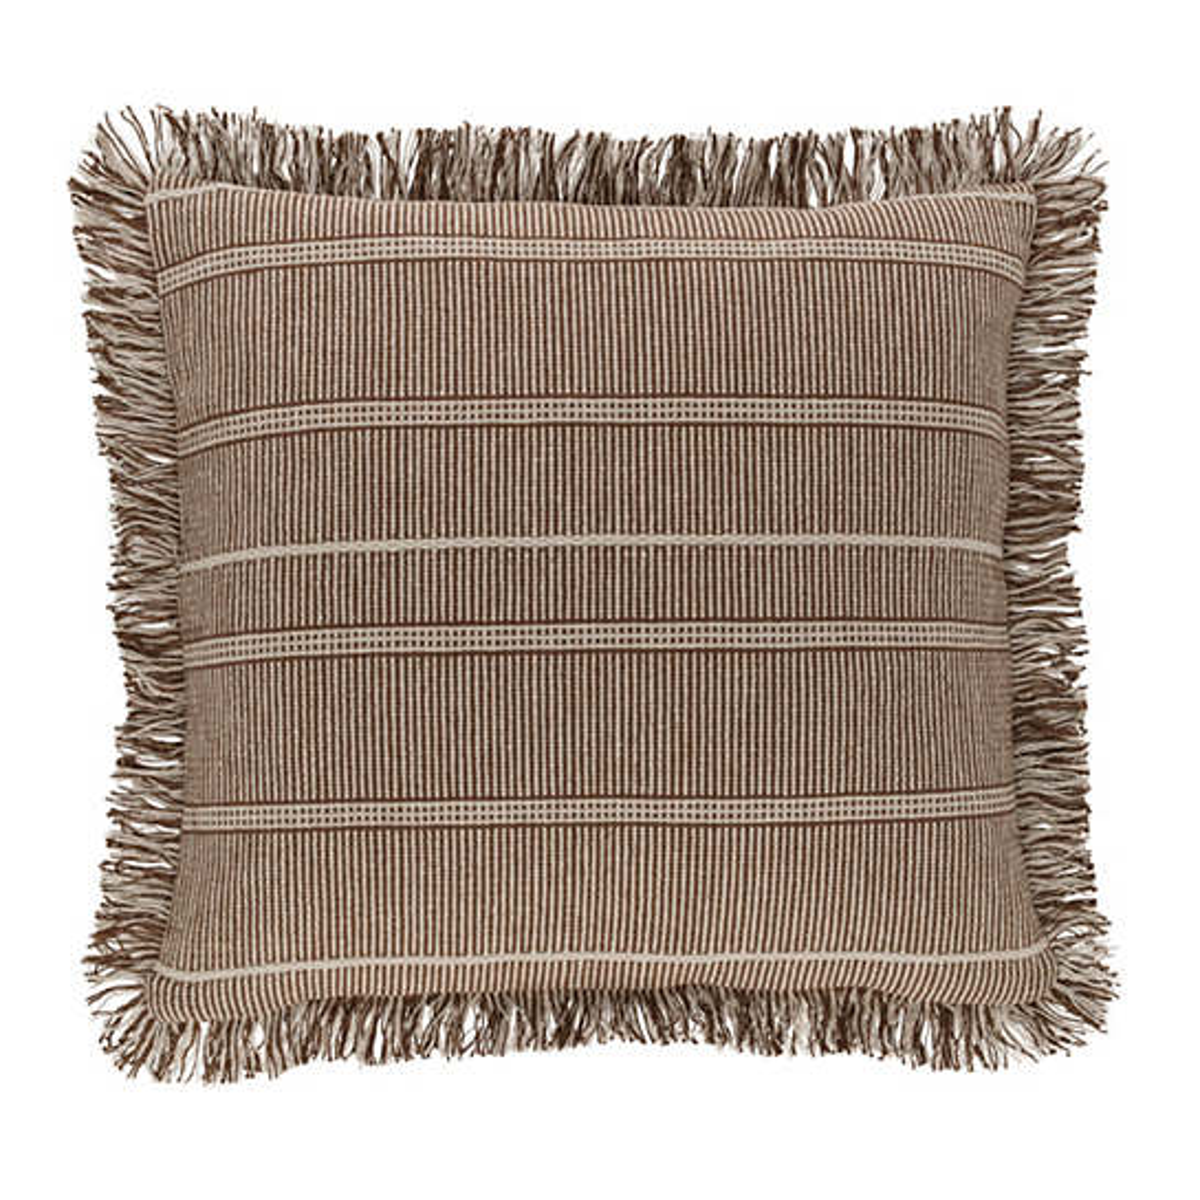 Samson Oak Woven Cotton Decorative Pillow